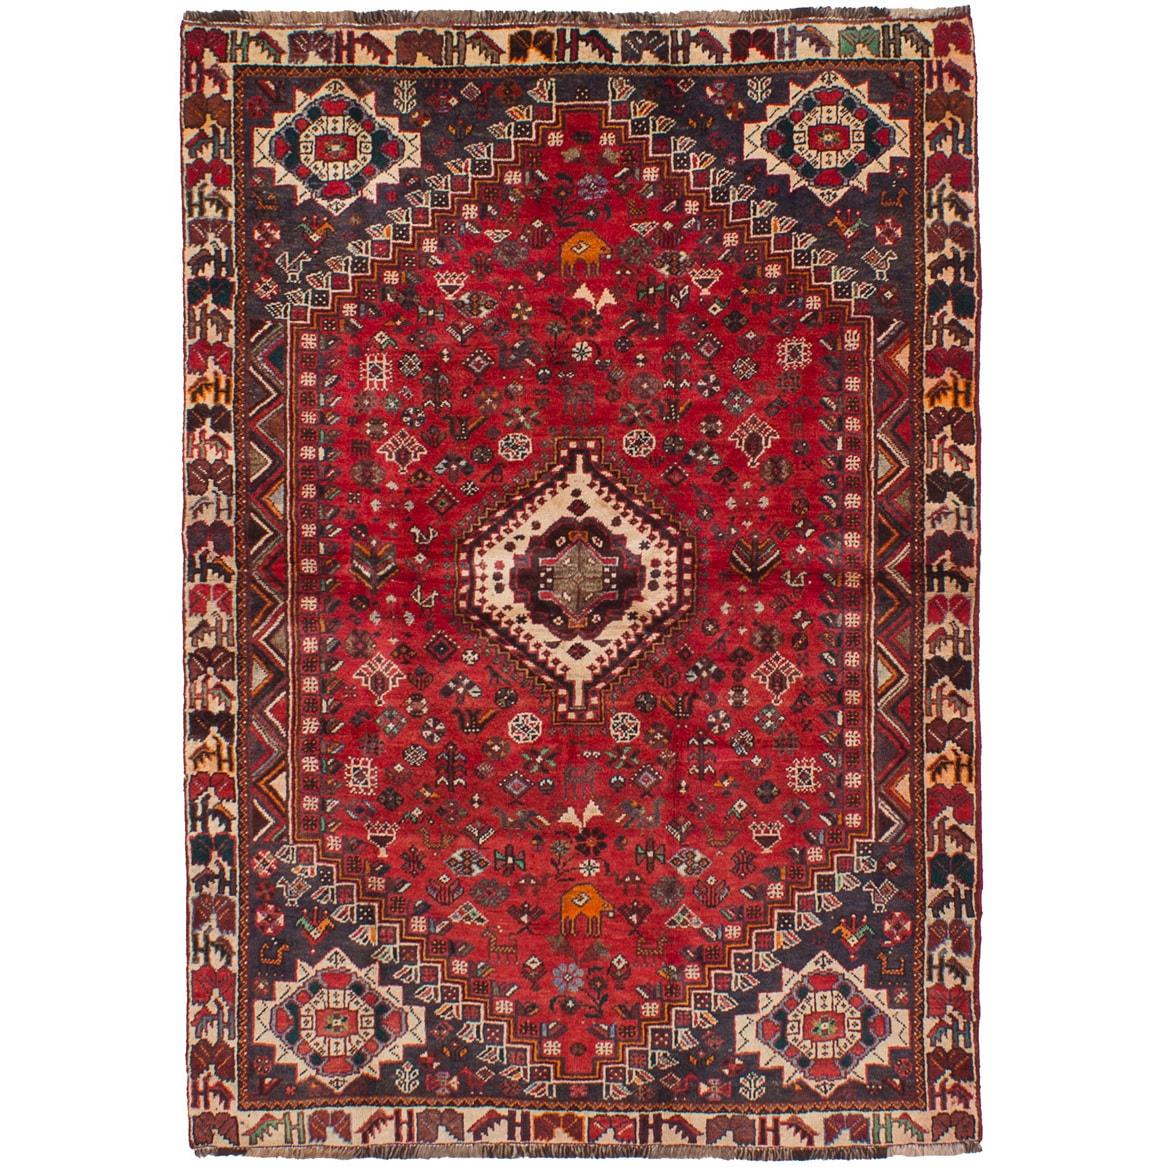 Ecarpetgallery Hand-Knotted Shiraz Qashqai Red Wool Rug (...